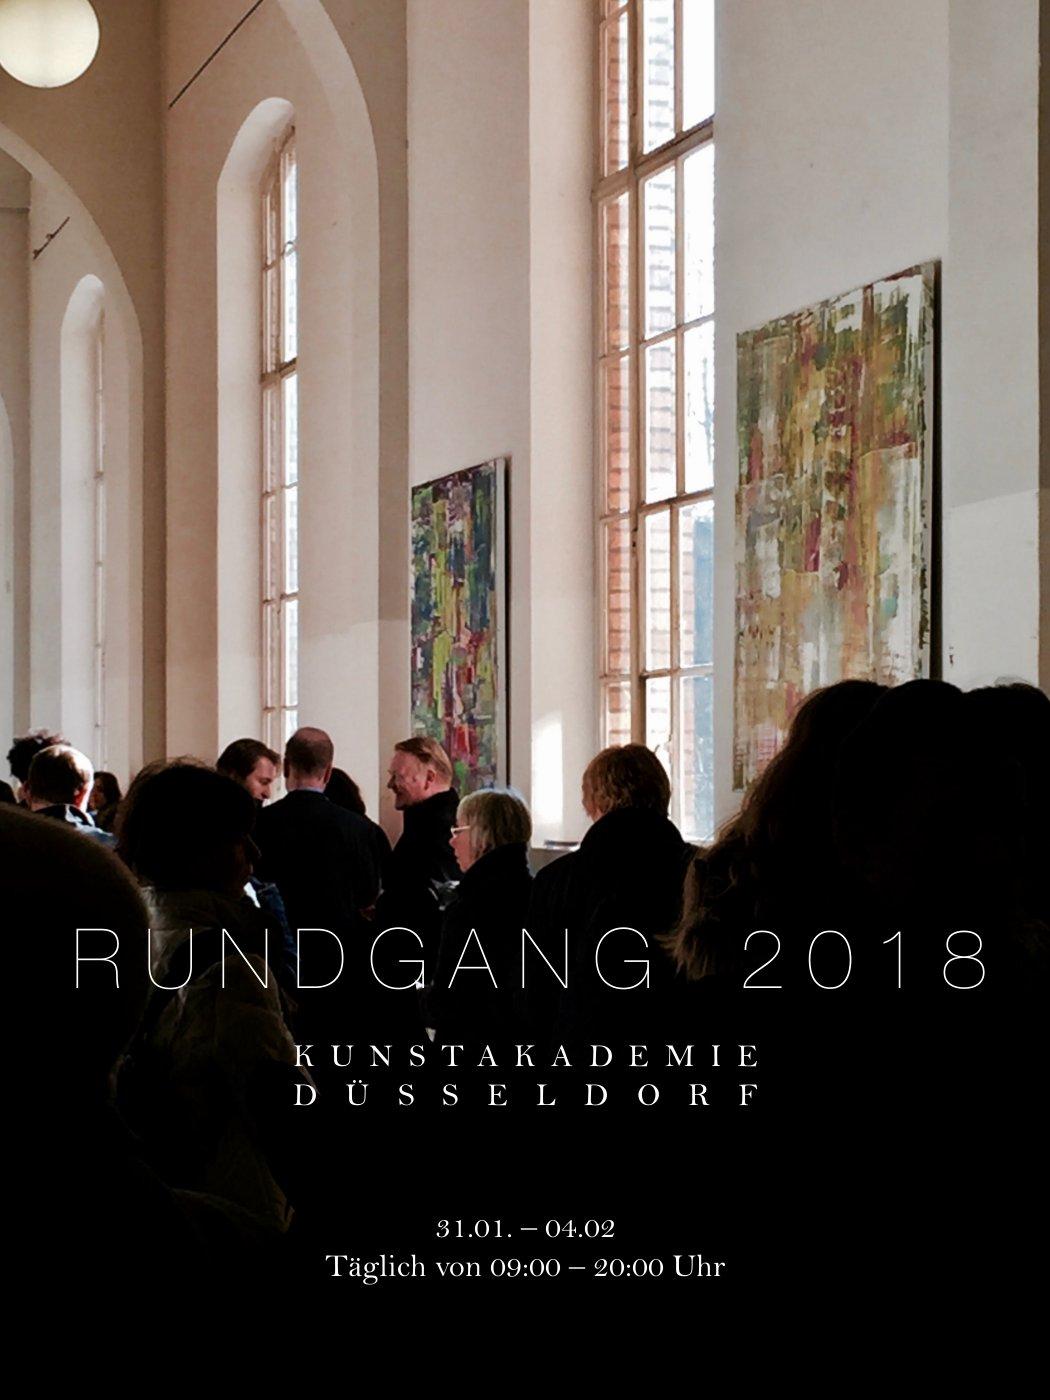 Rundgang 2018 Kunstakademie Düsseldorf